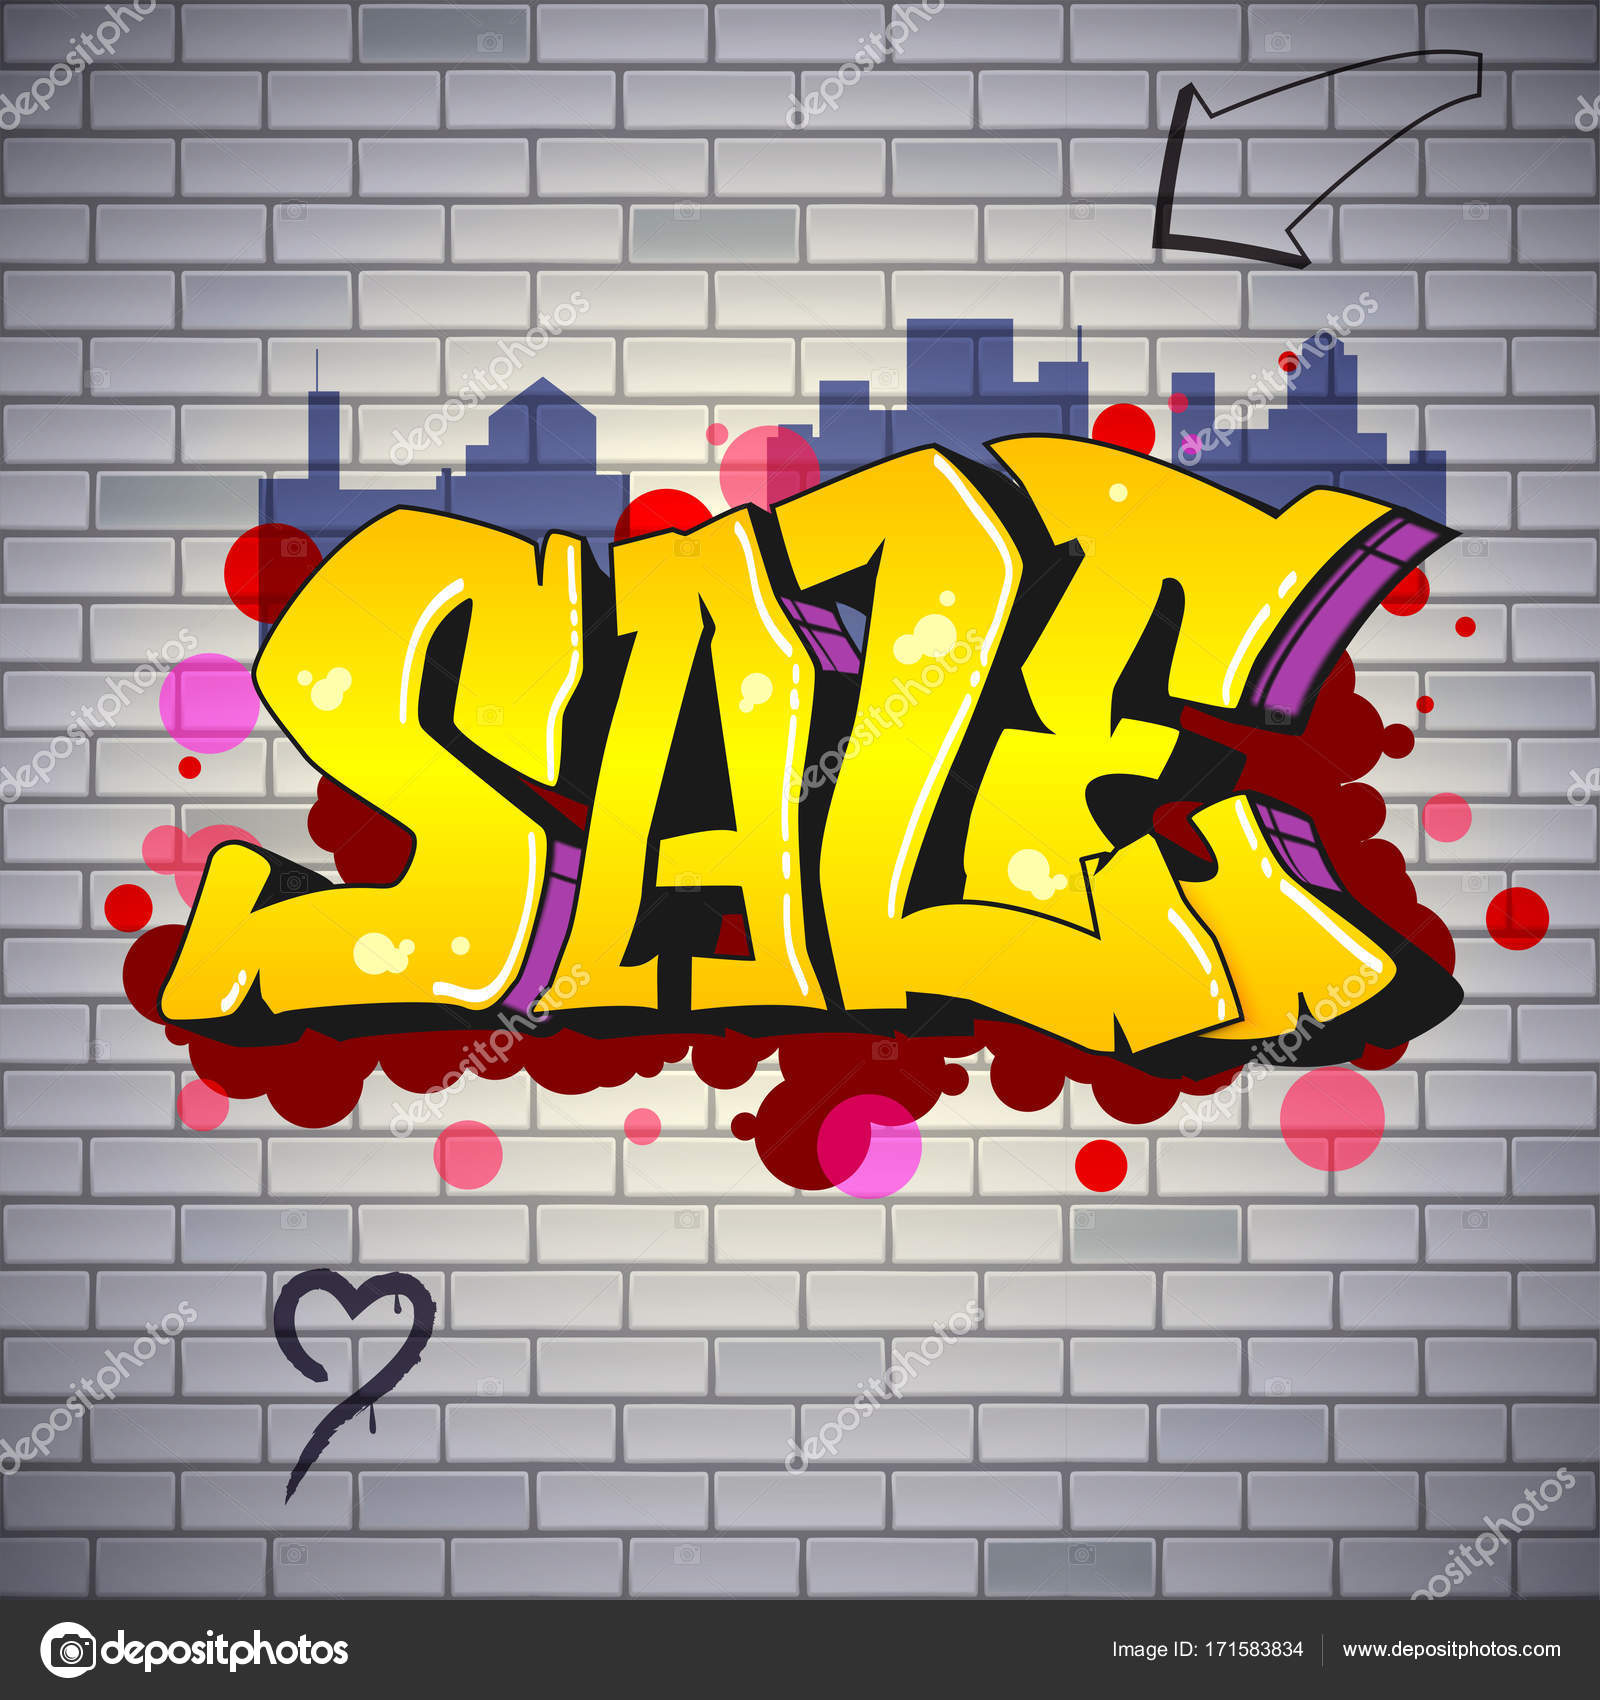 Sale, lettering in Hip-hop, graffiti style. Street art on the brick ...